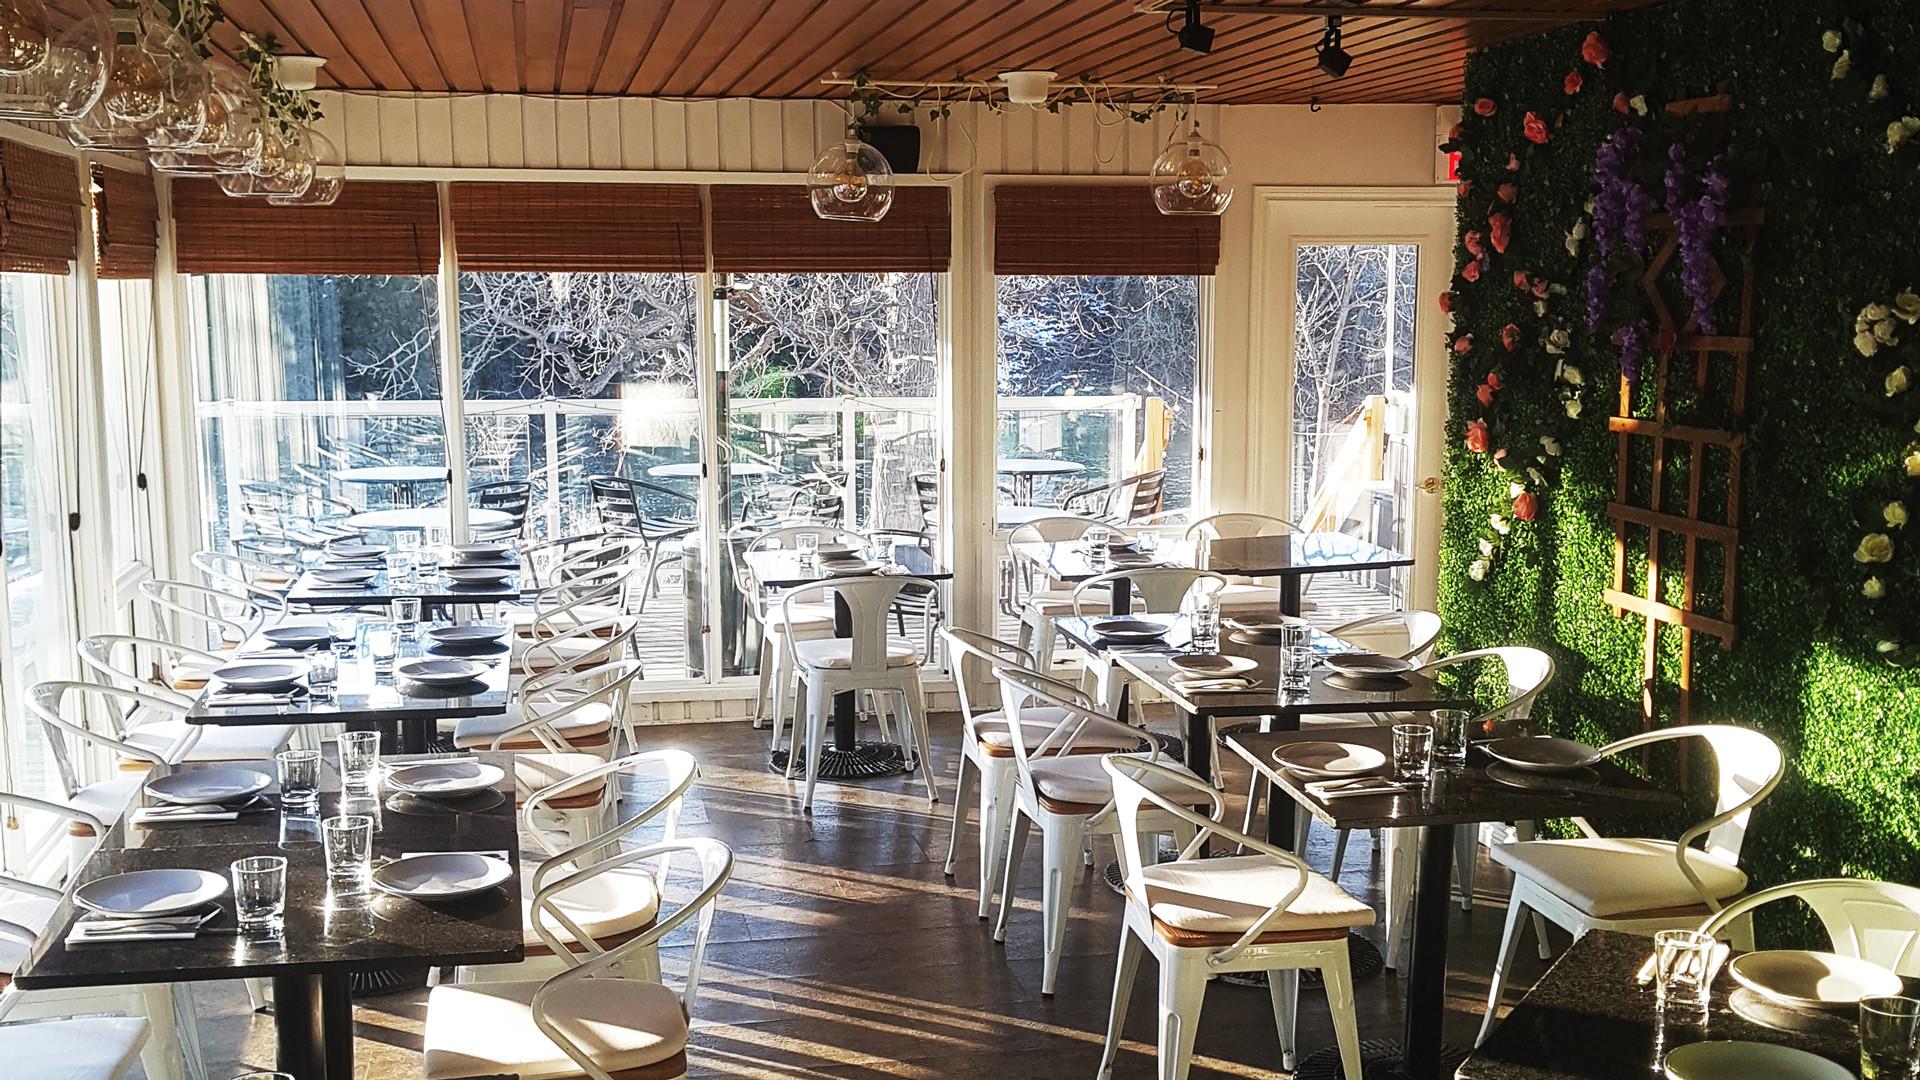 The interior of La Fontana, one of the best Elora restaurants